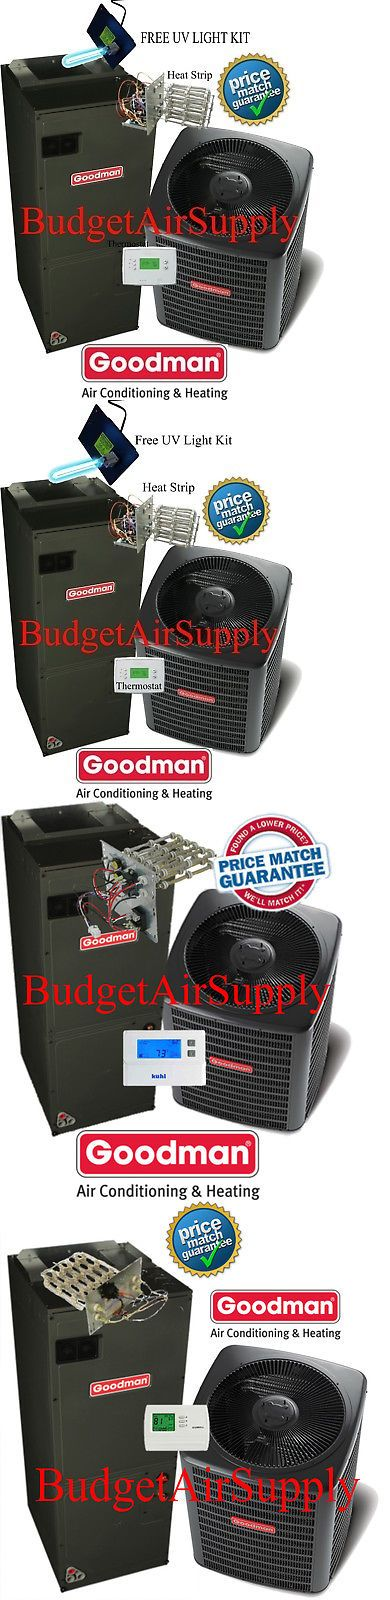 Central Air Conditioners 185108 2 5 Ton 16 Seer Goodman Heat Pump System Gsz160301 Aspt37c14 Tstat Heat Pump System Goodman Heat Pump Central Air Conditioners